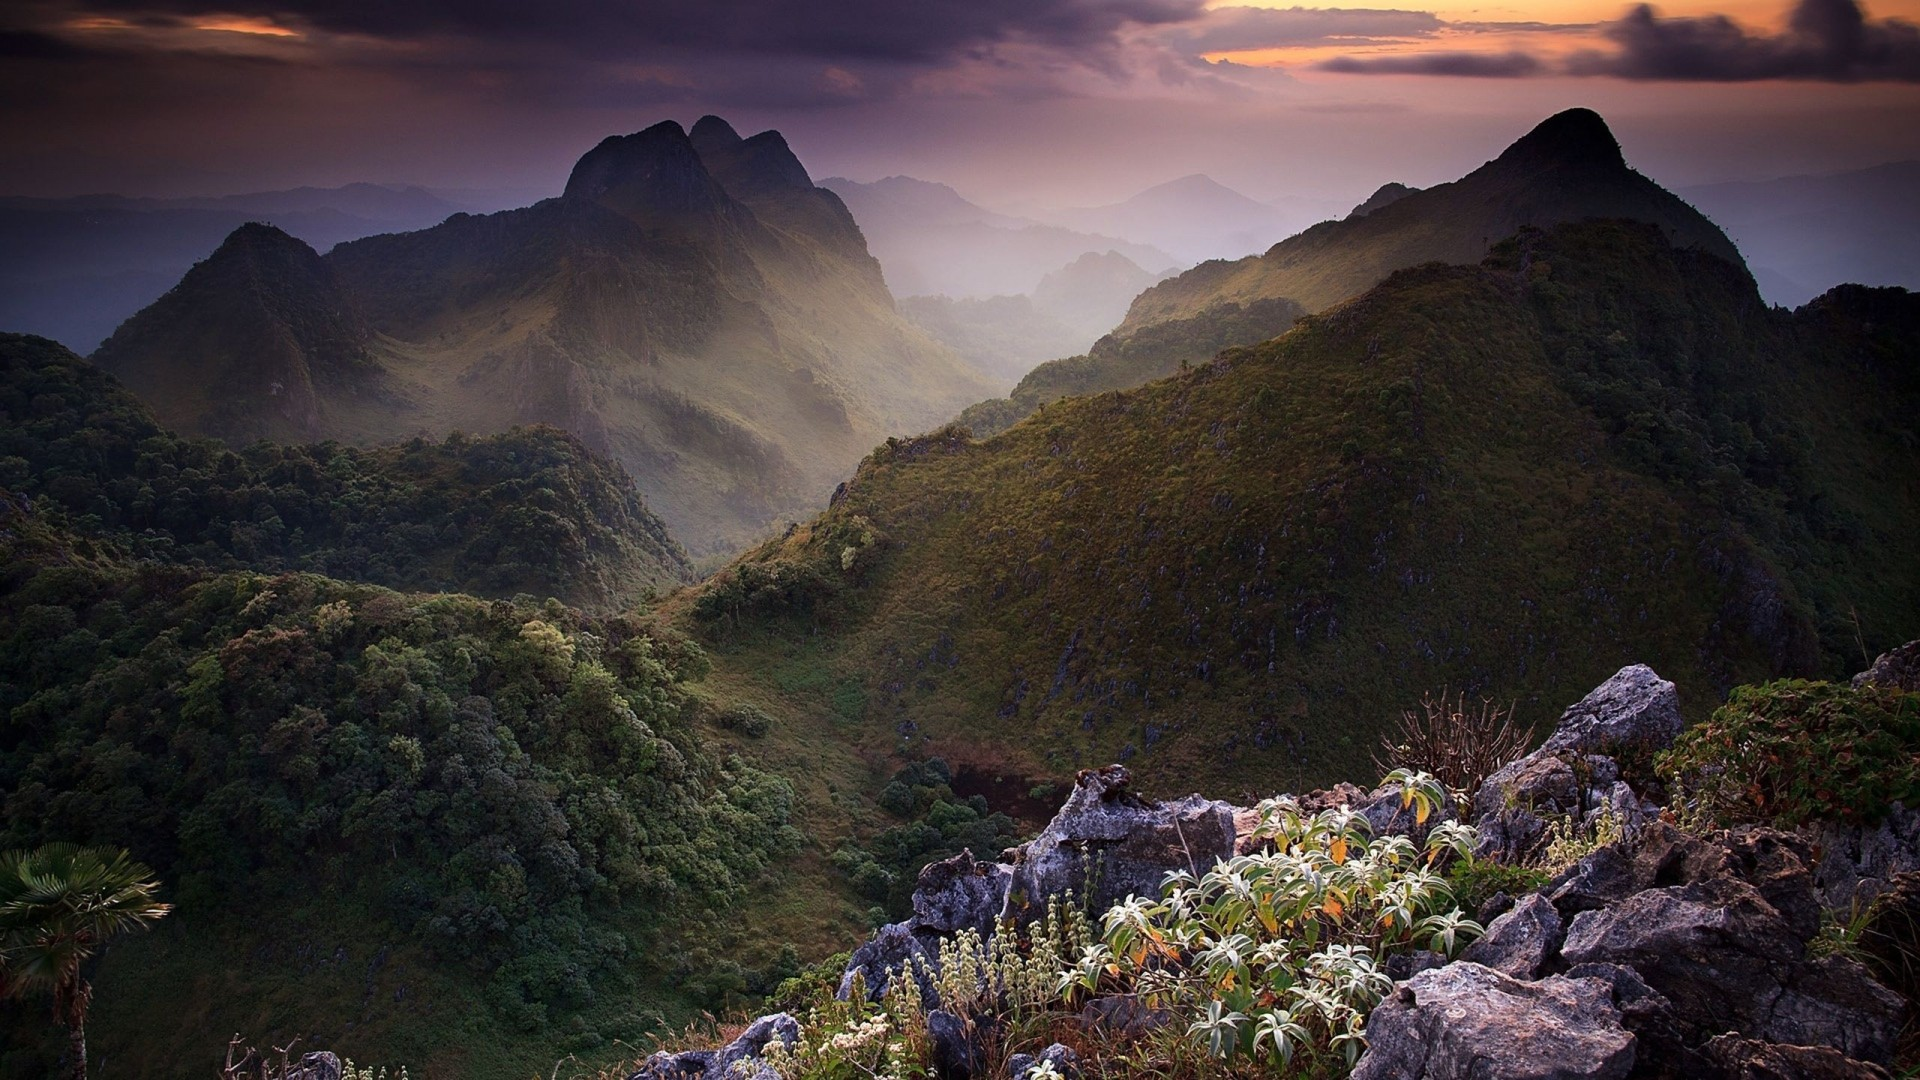 Download Wallpaper Grass, Rocks, mountains Full HD 1080p HD  Background